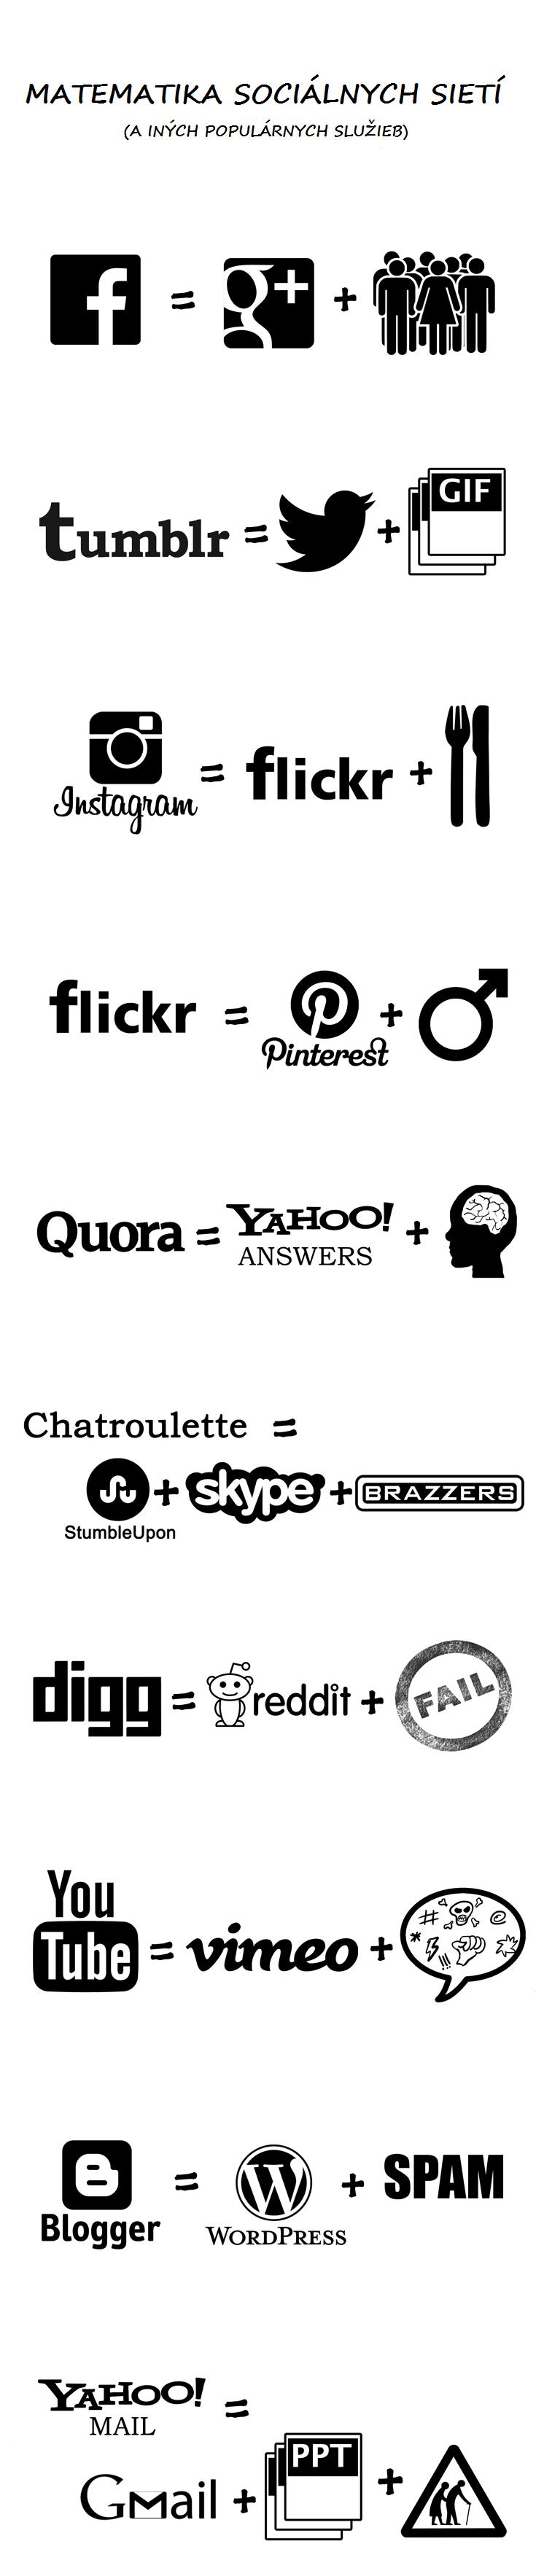 socialne siete